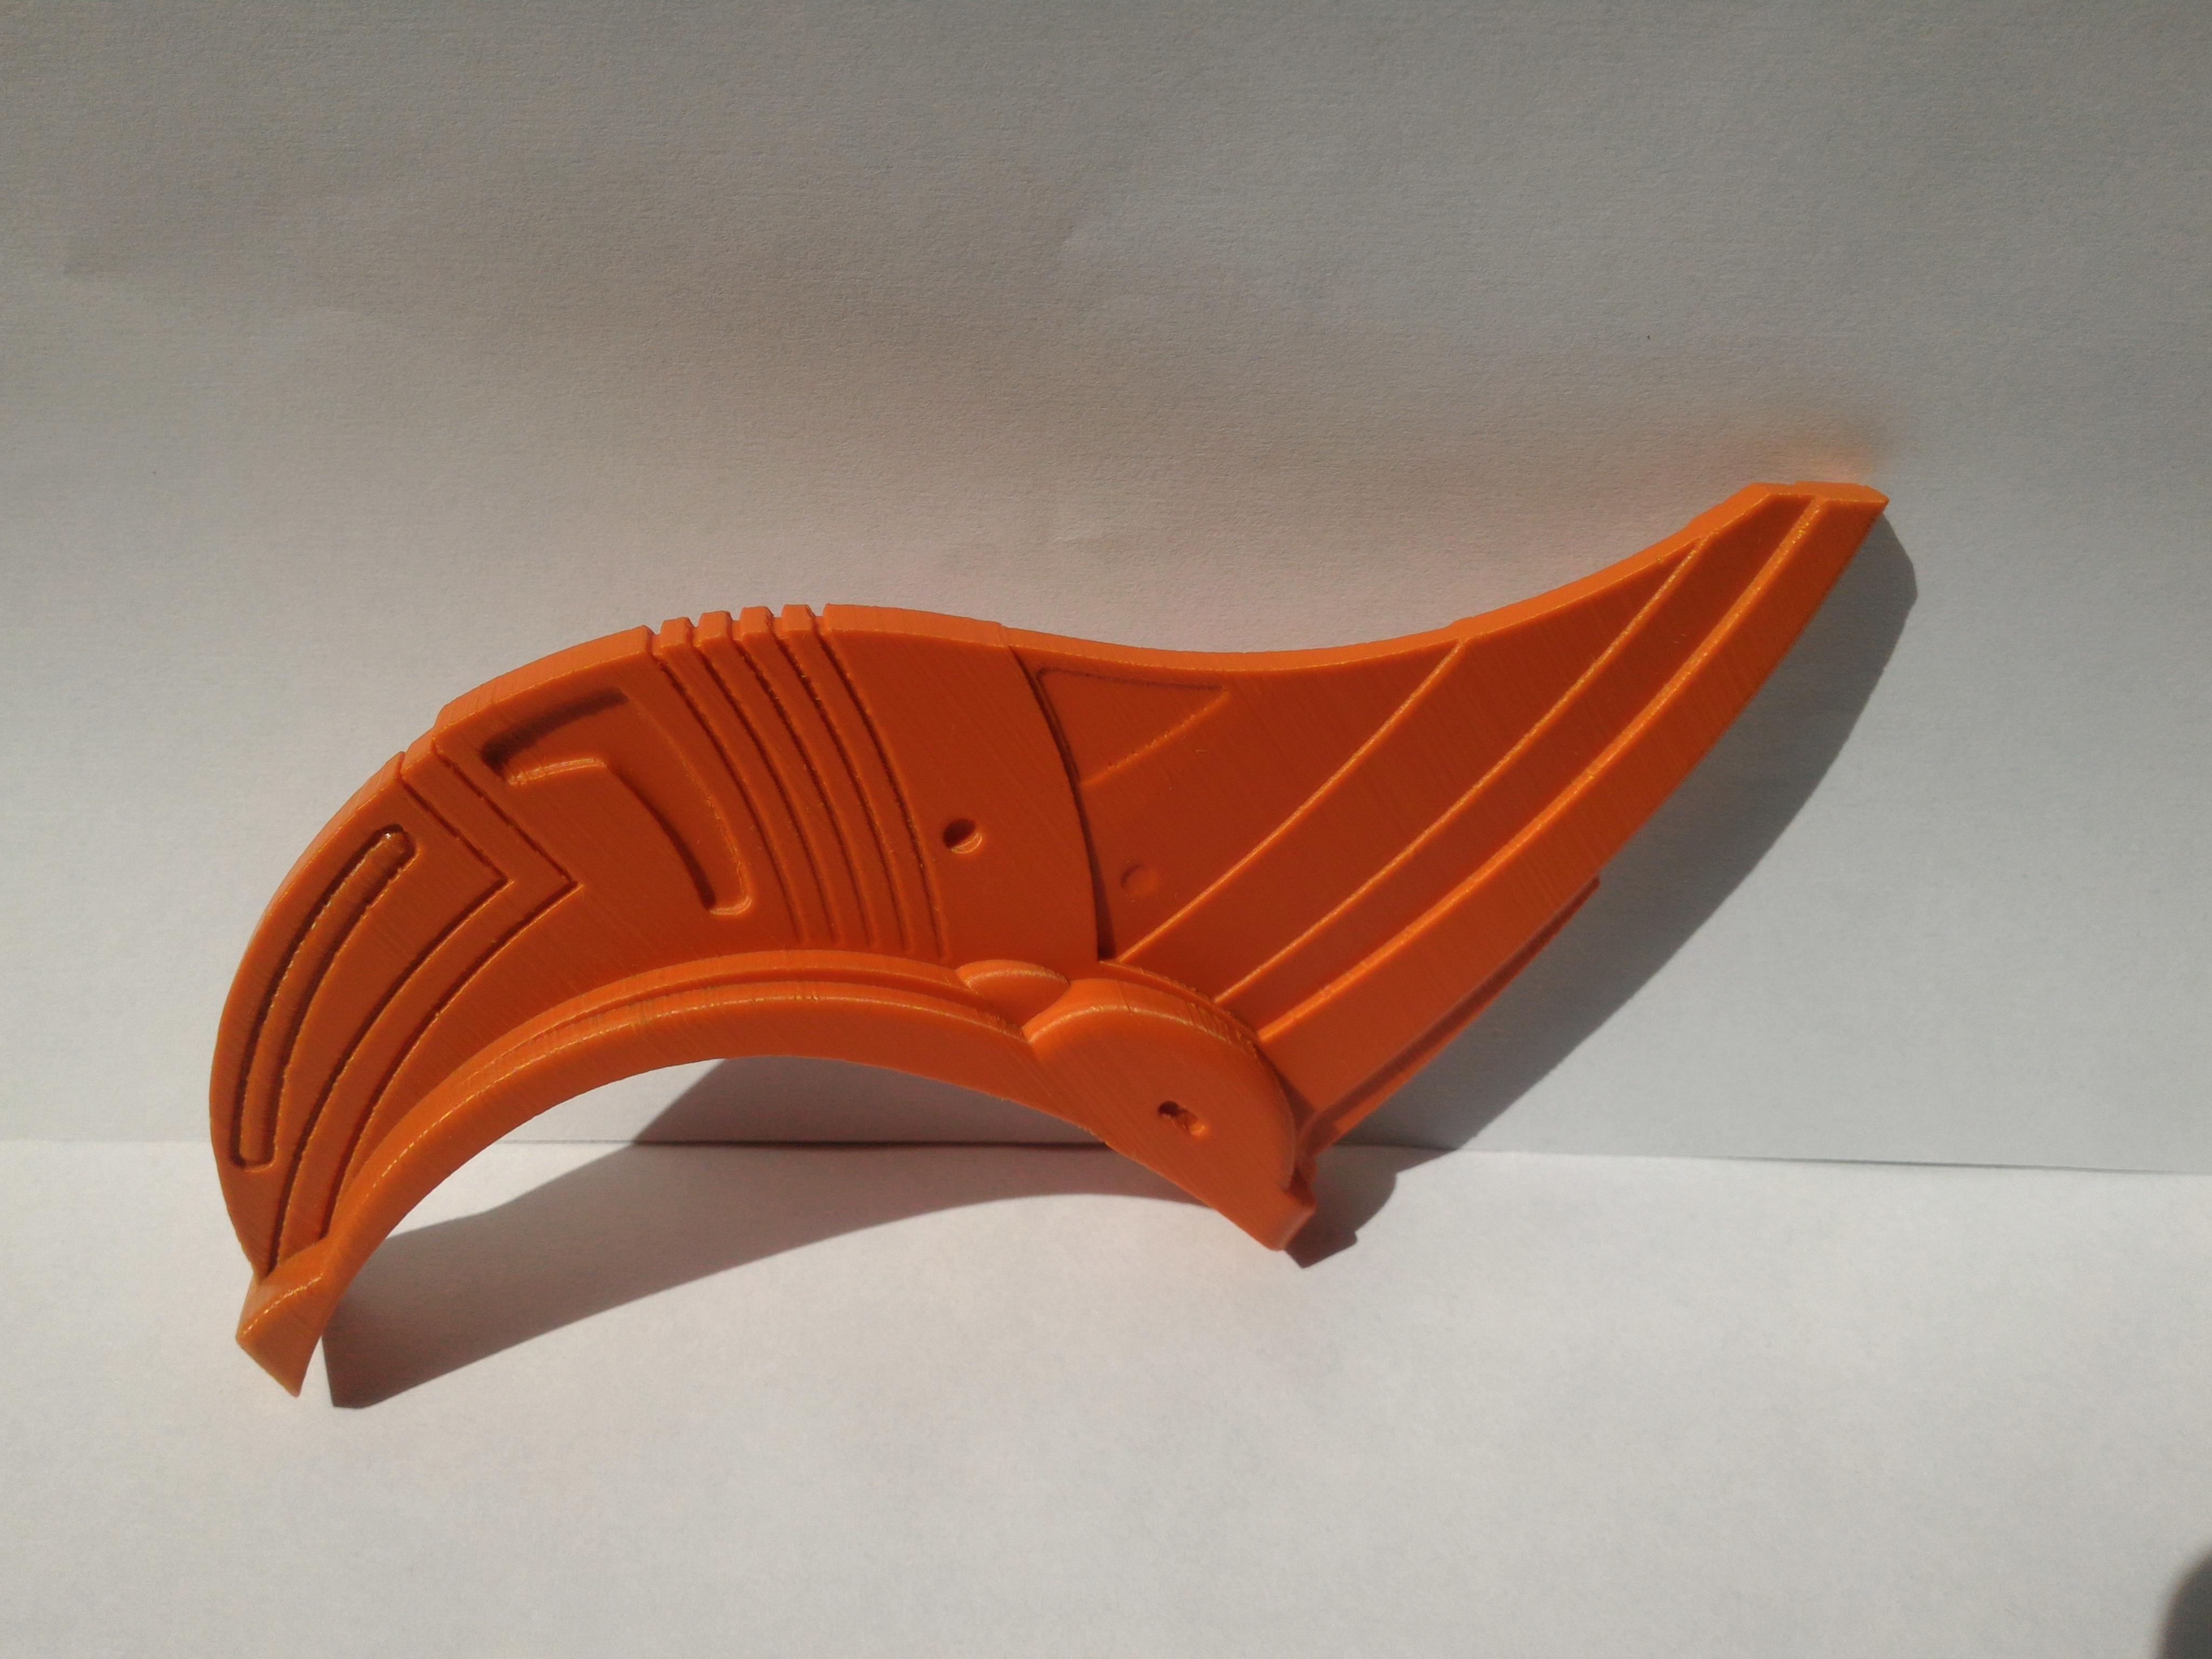 Yondu - Prototype Fin